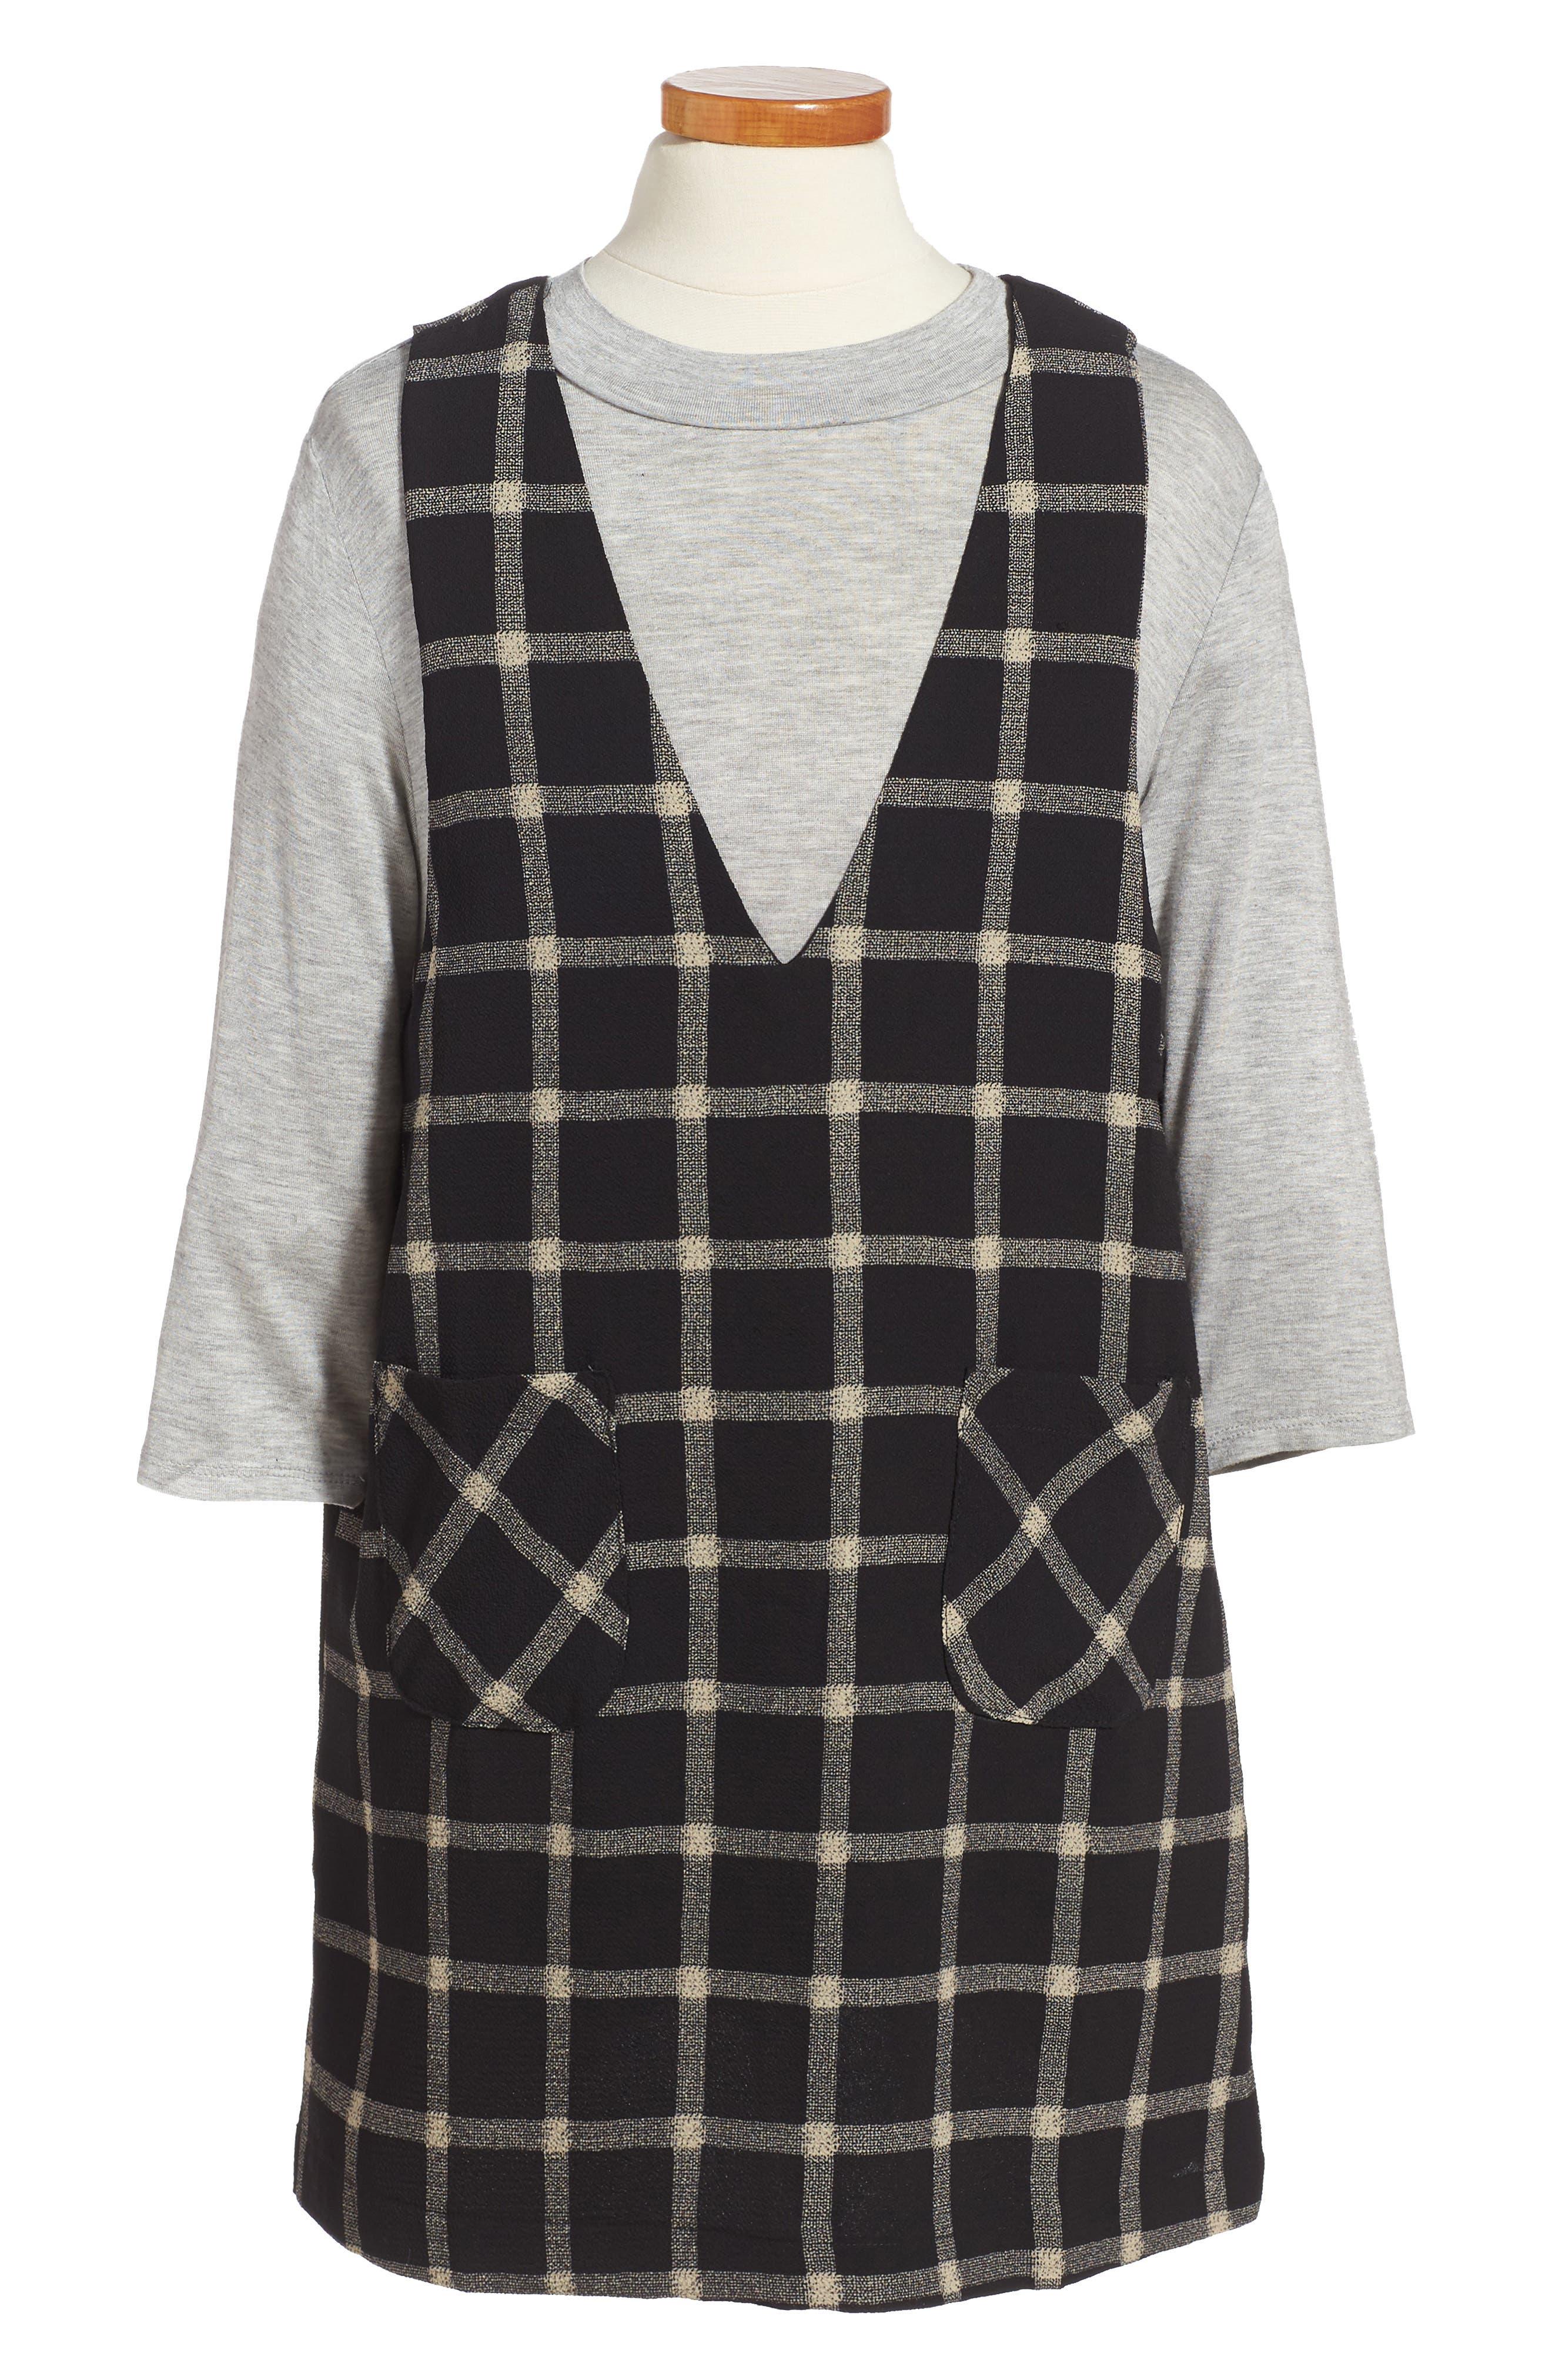 Plaid Top & Jumper Dress Set,                         Main,                         color, Black/ White Windowpane